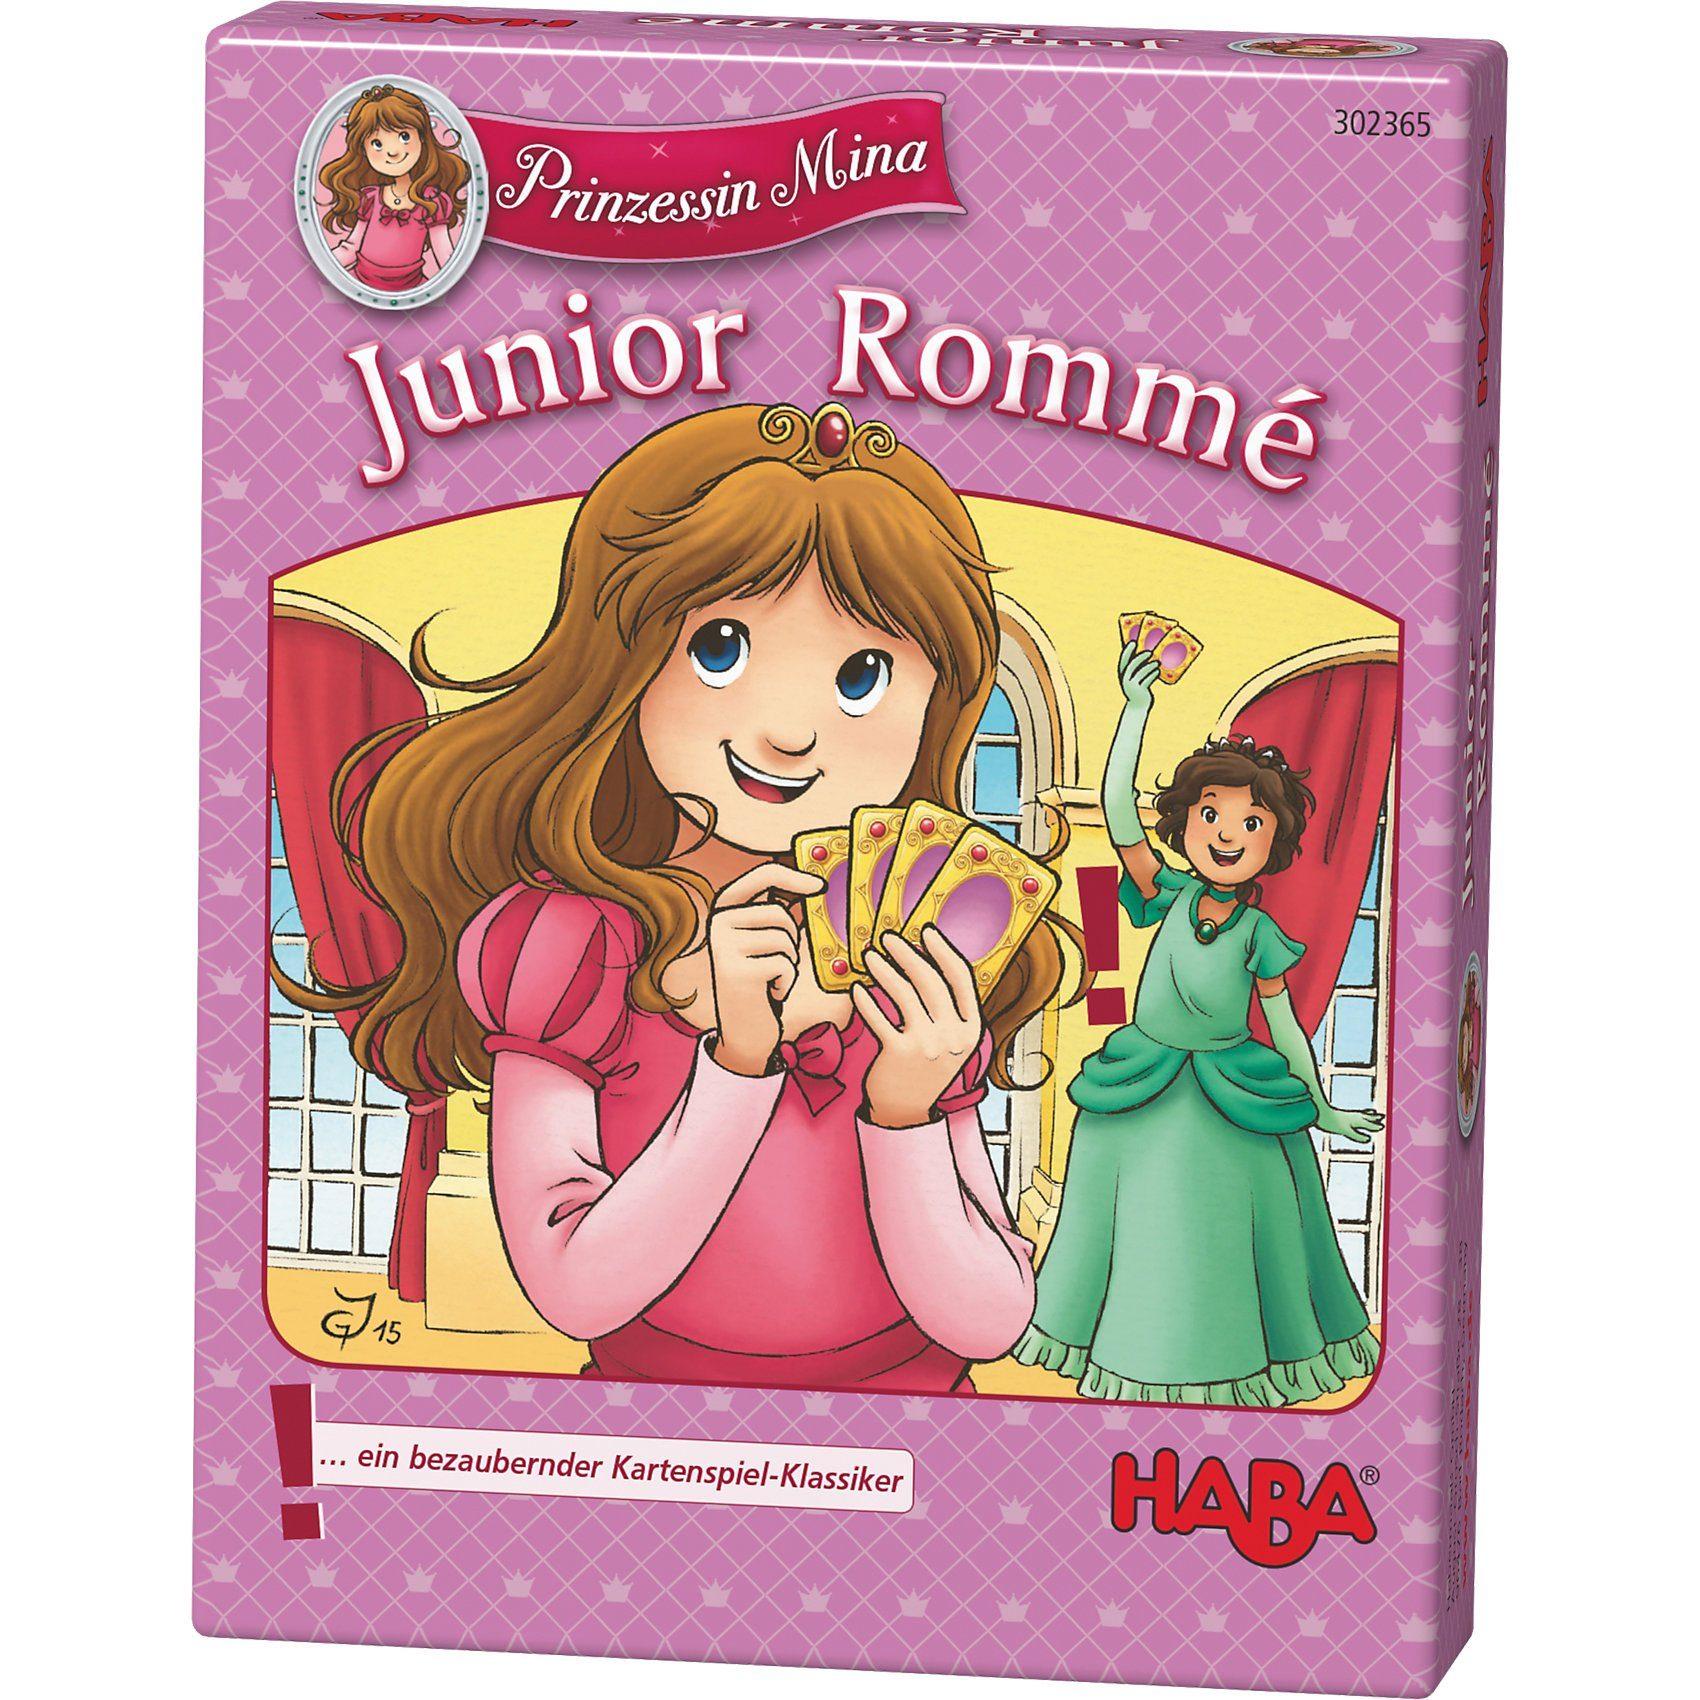 Haba Prinzessin Mina - Junior Rommé